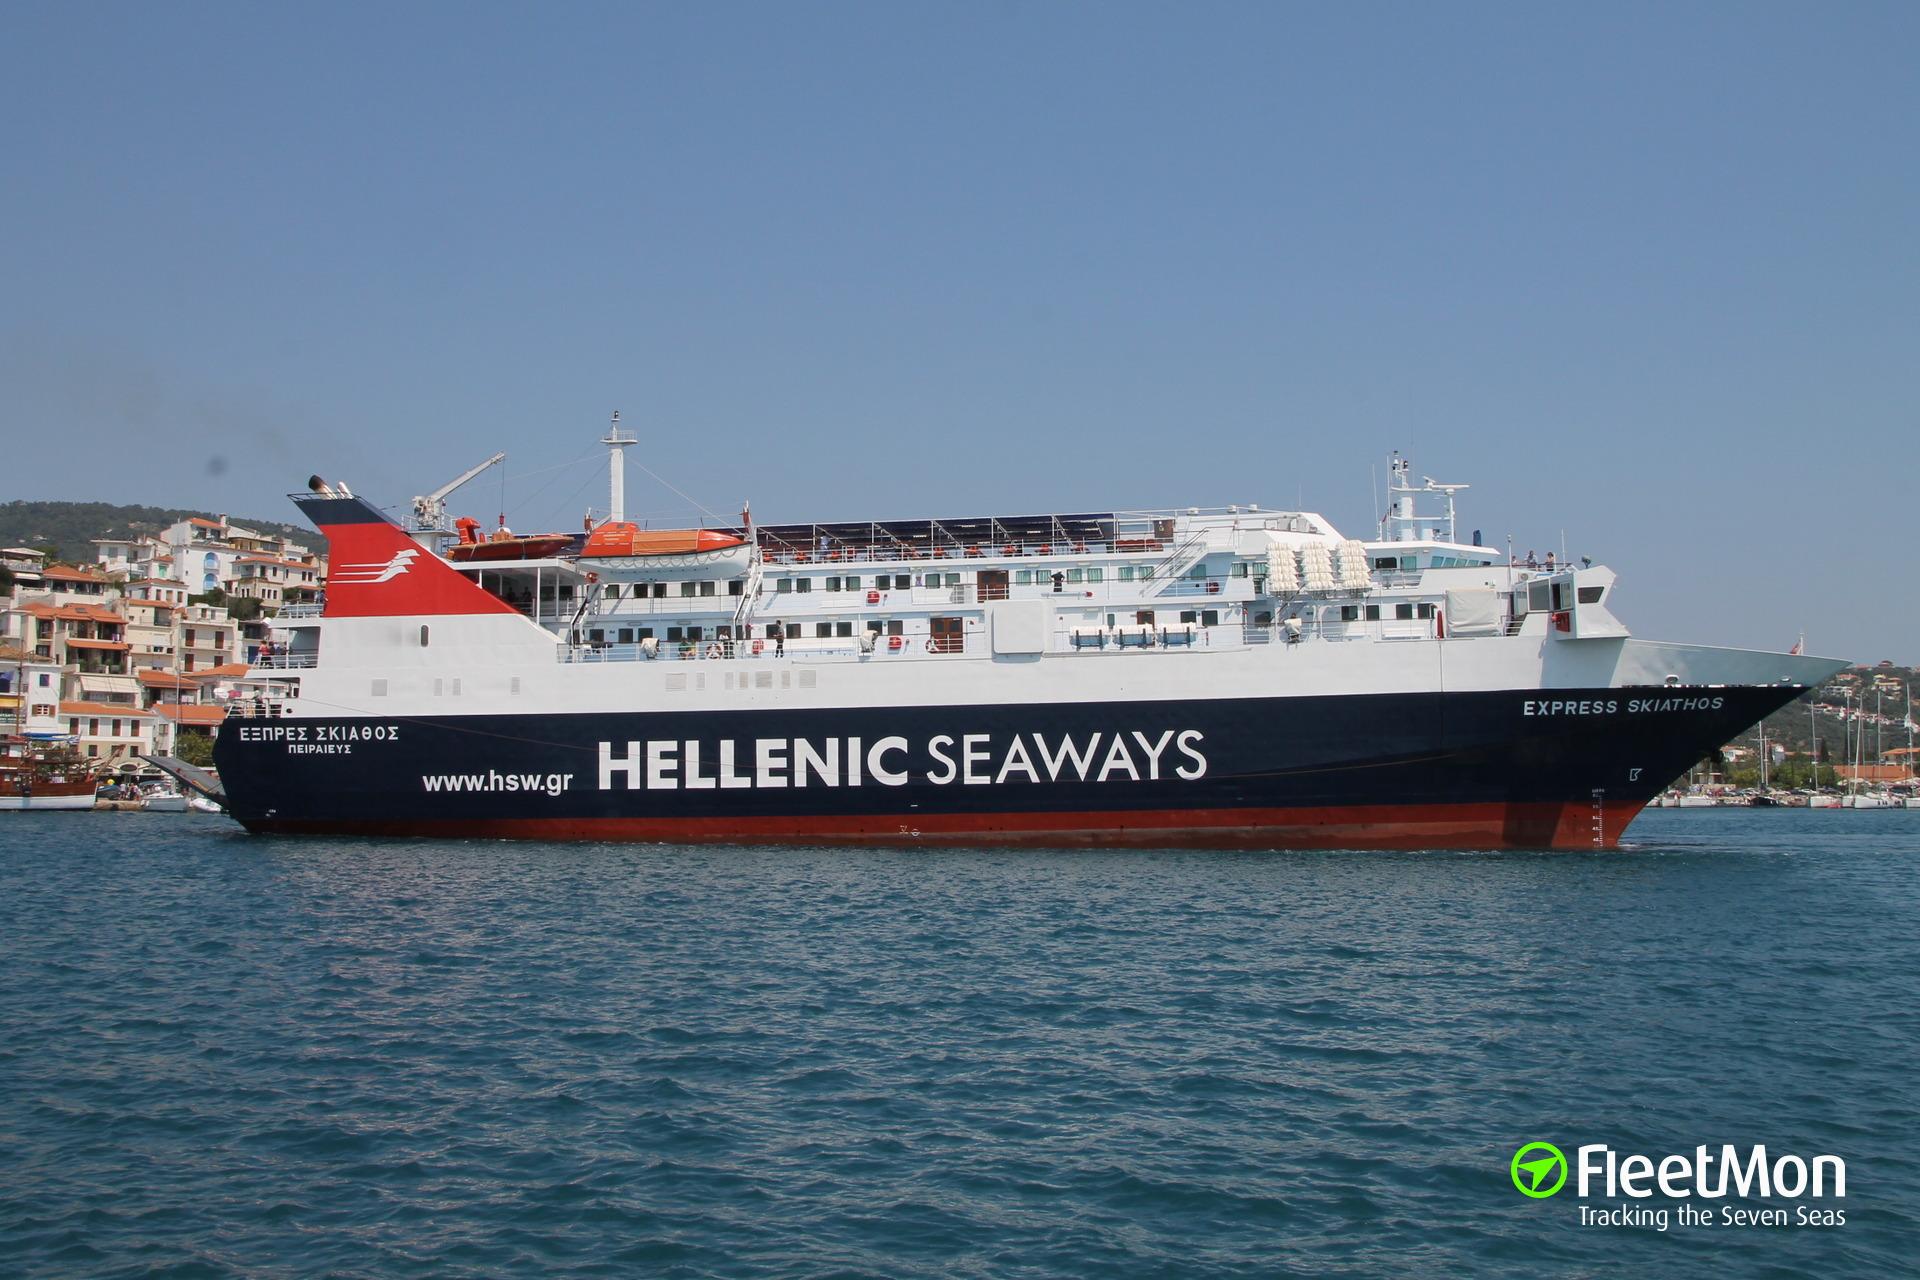 Ferry Express Skiathos interrupted her trip to Sporades archipelago